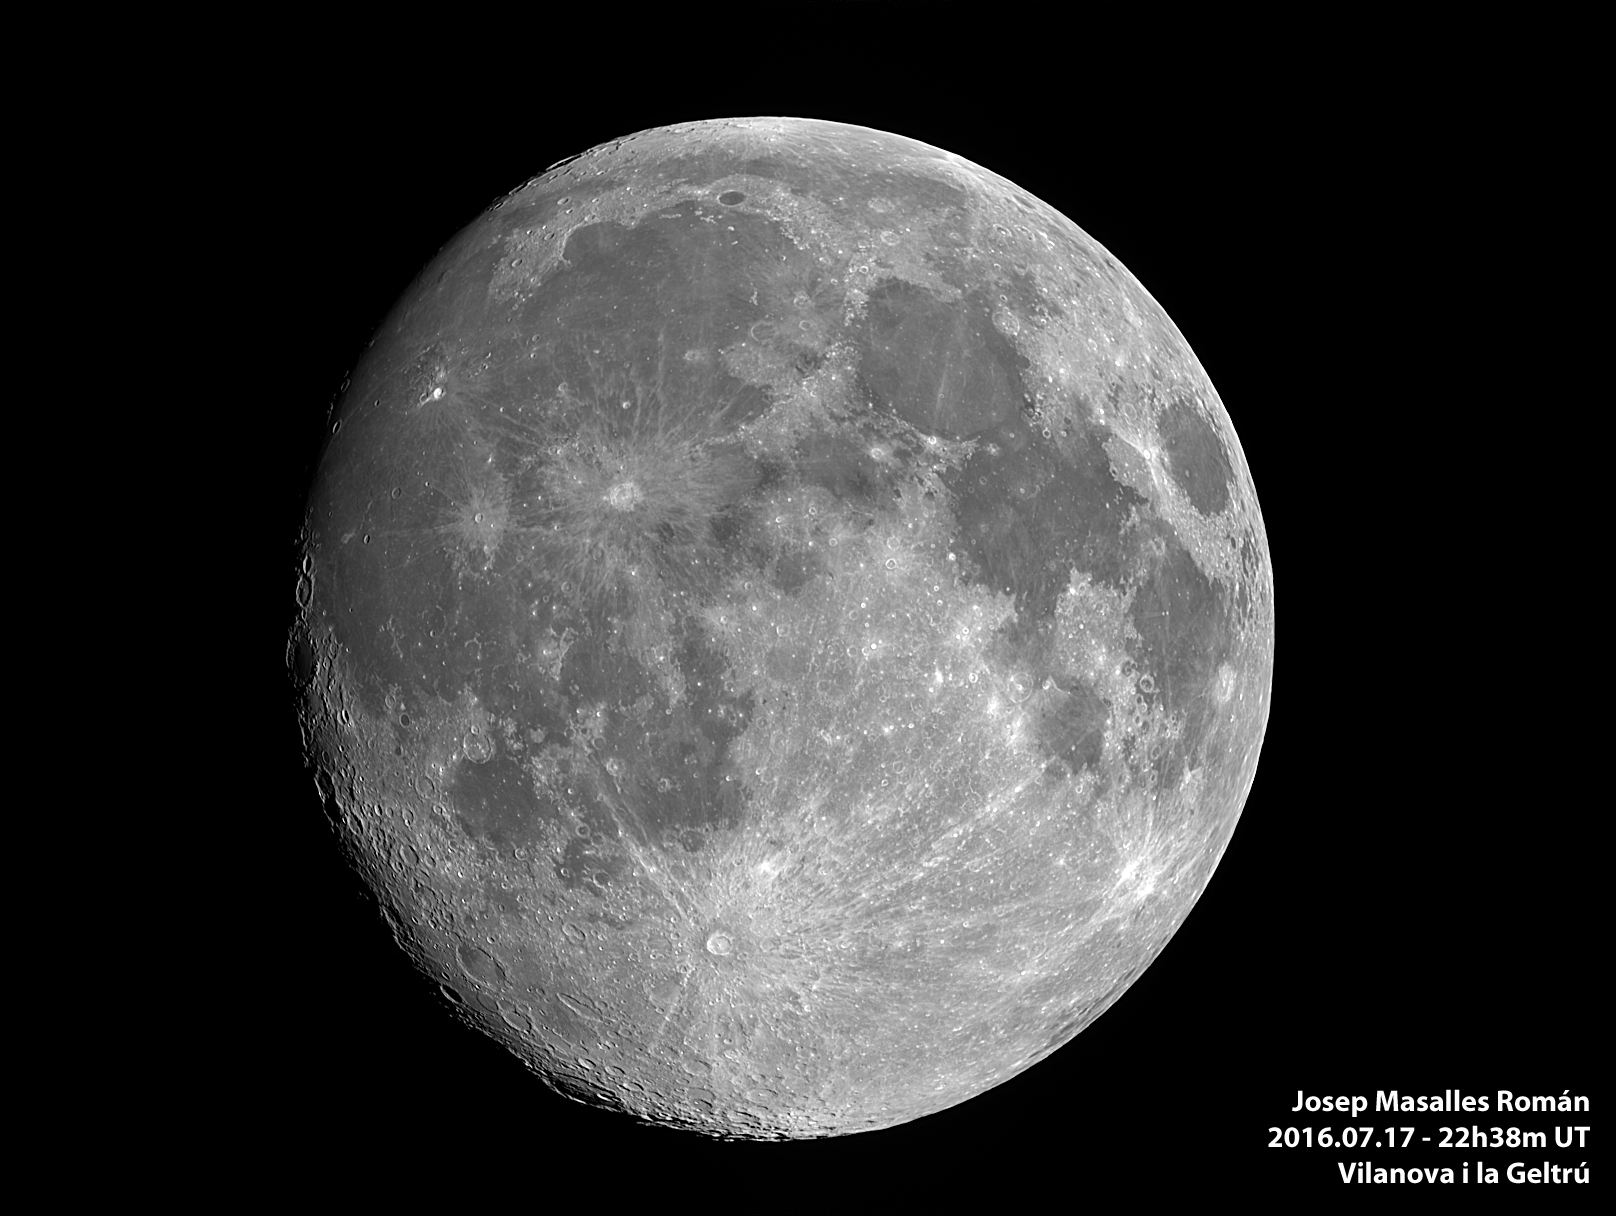 20170717-22h38mUT-Lluna-JMR